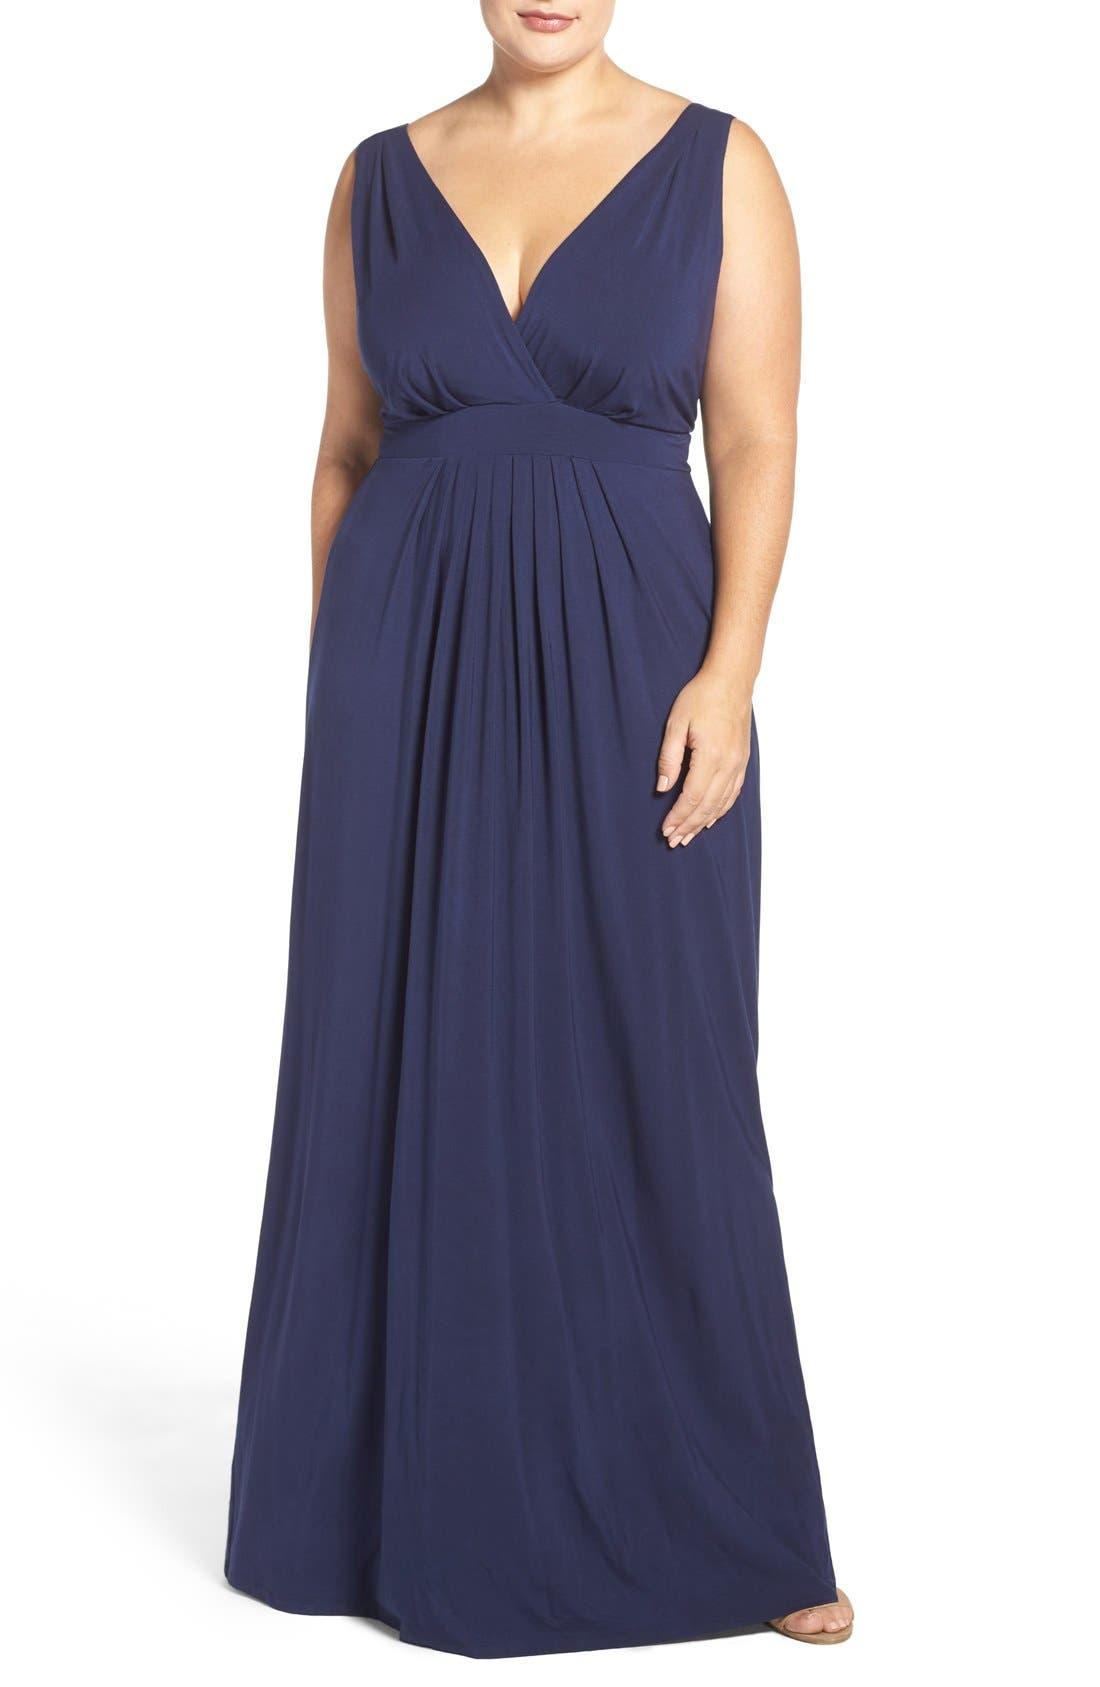 Tart Chloe Empire Waist Maxi Dress (Plus Size)